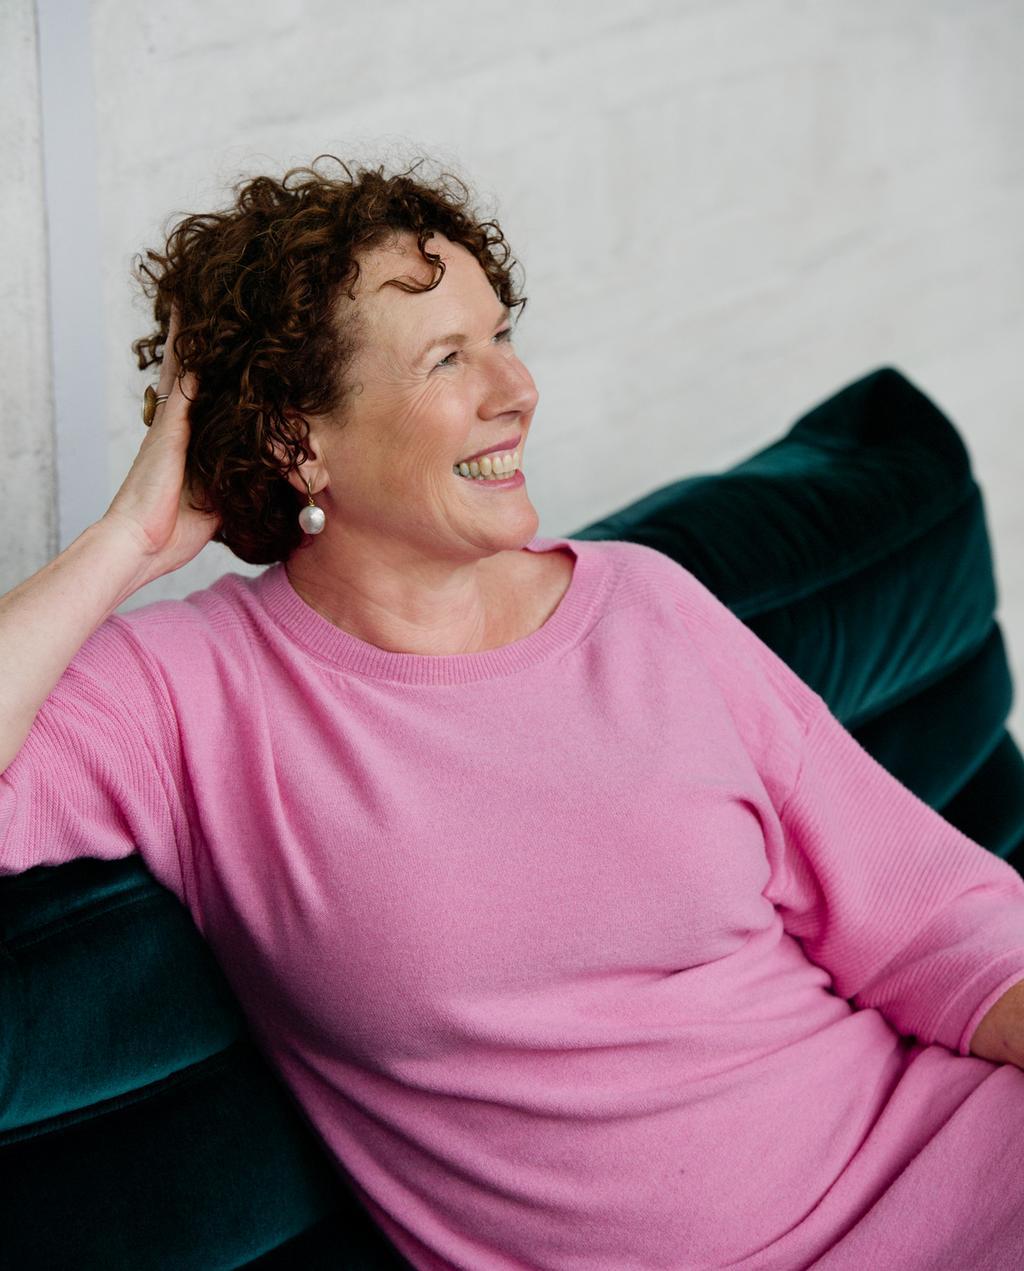 vtwonen weer verliefd op je huis | seizoen 11 aflevering 2 | Marianne Luning in Osdorp